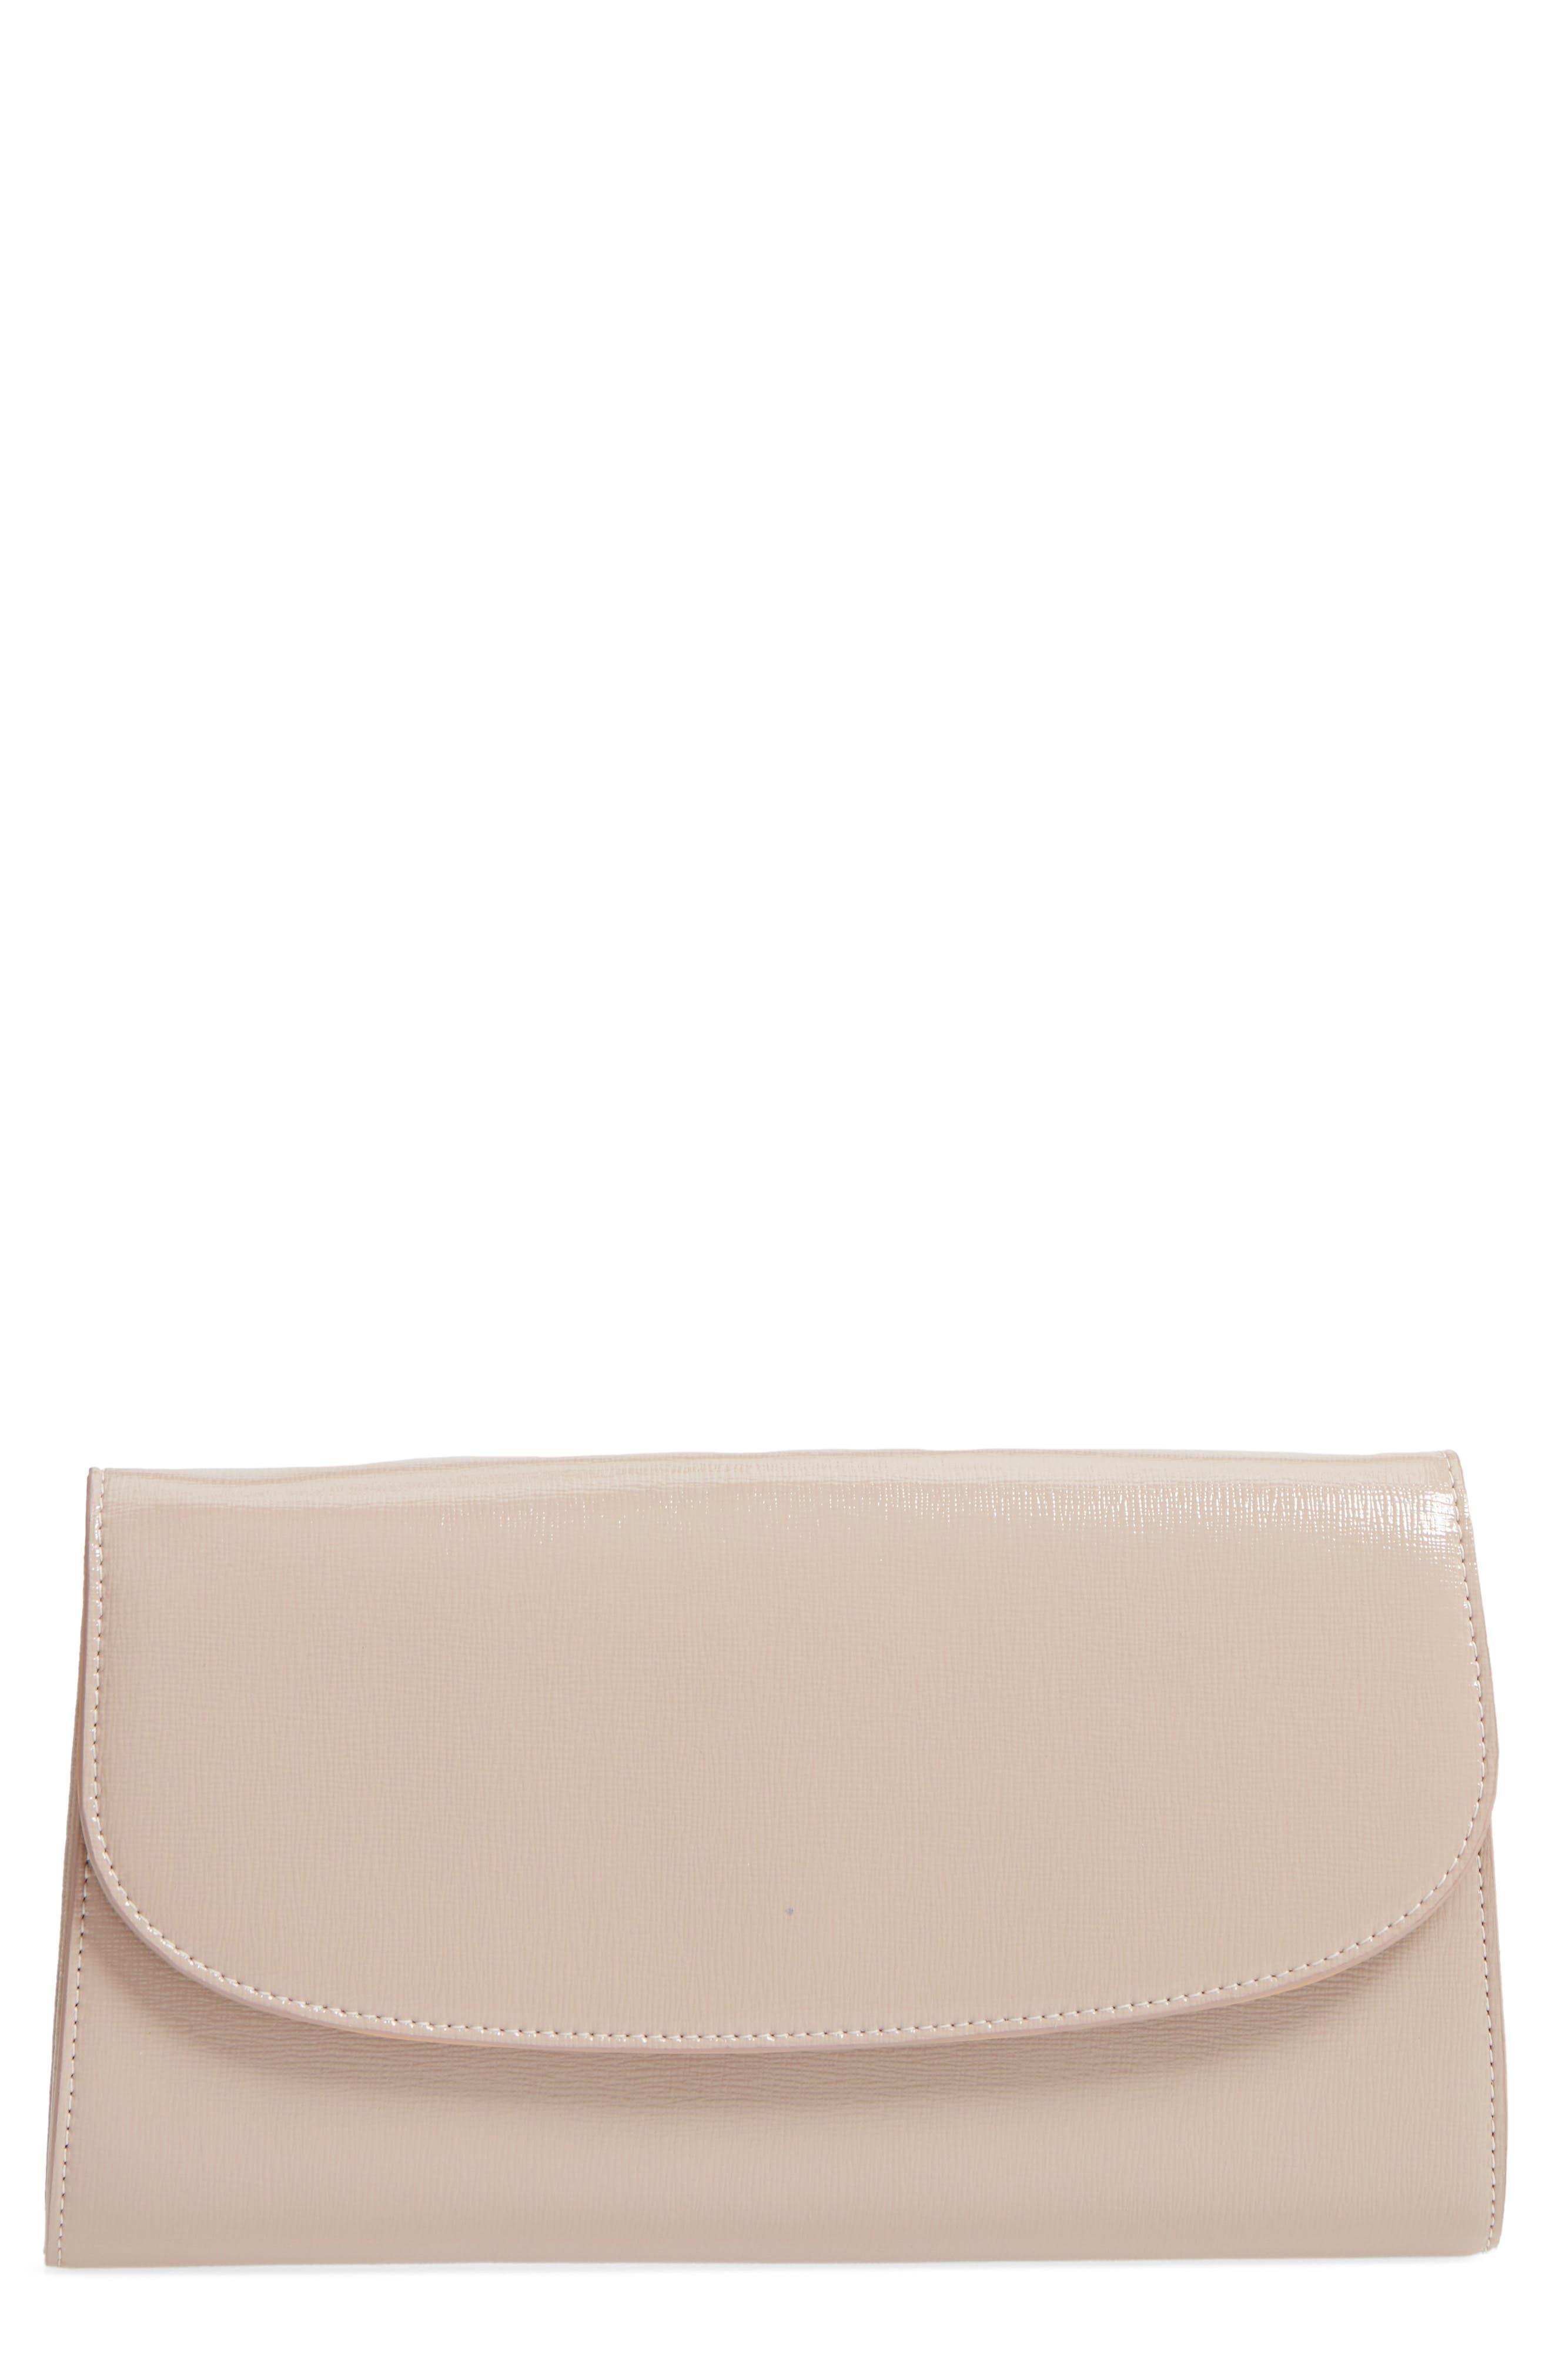 Leather Clutch,                         Main,                         color, GREY BARK